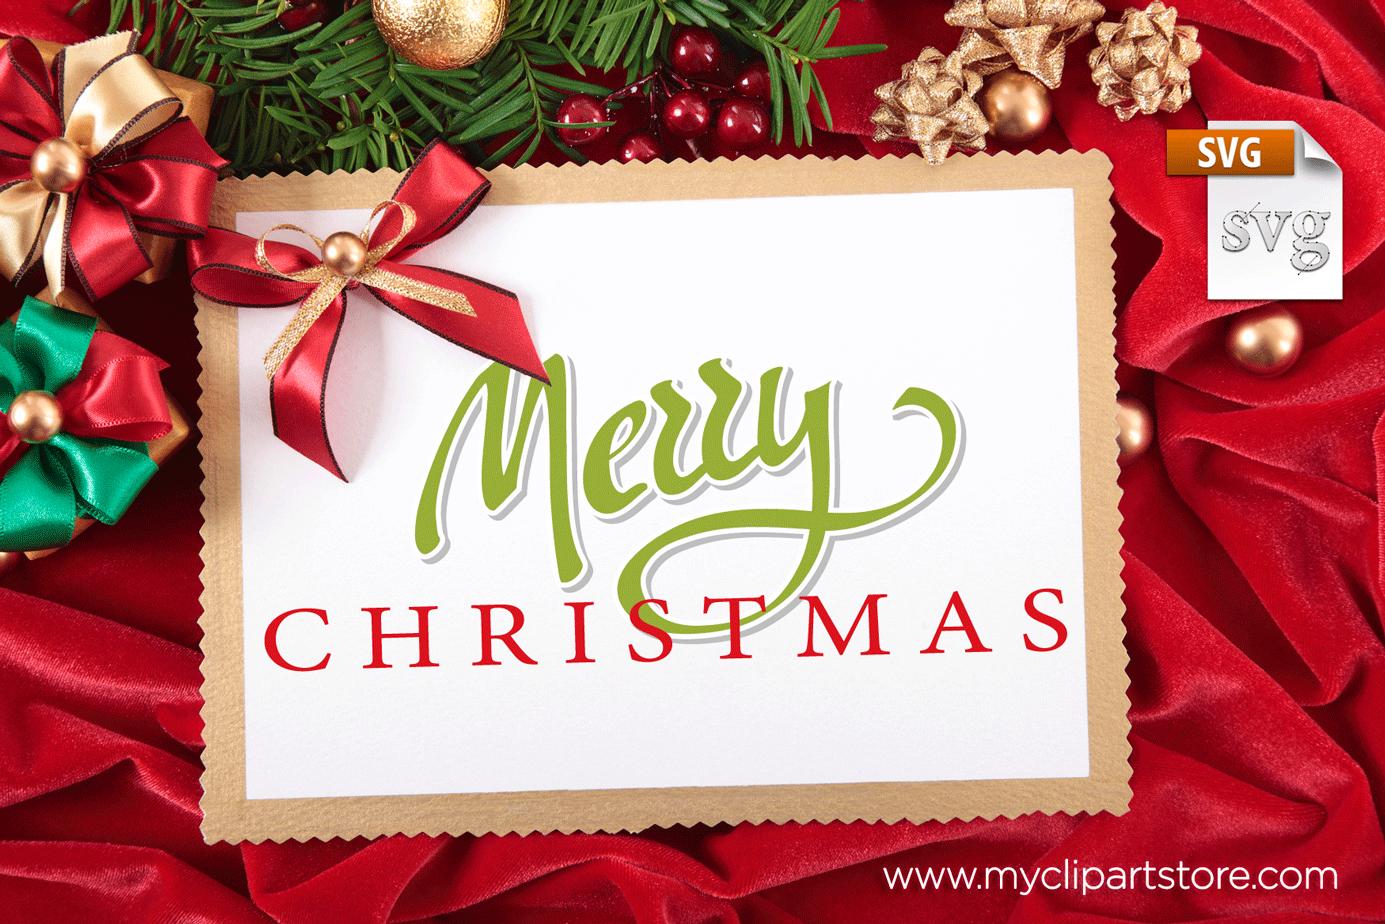 Word Art Christmas Premium Vector Clip Art Freebie From Myclipartstore